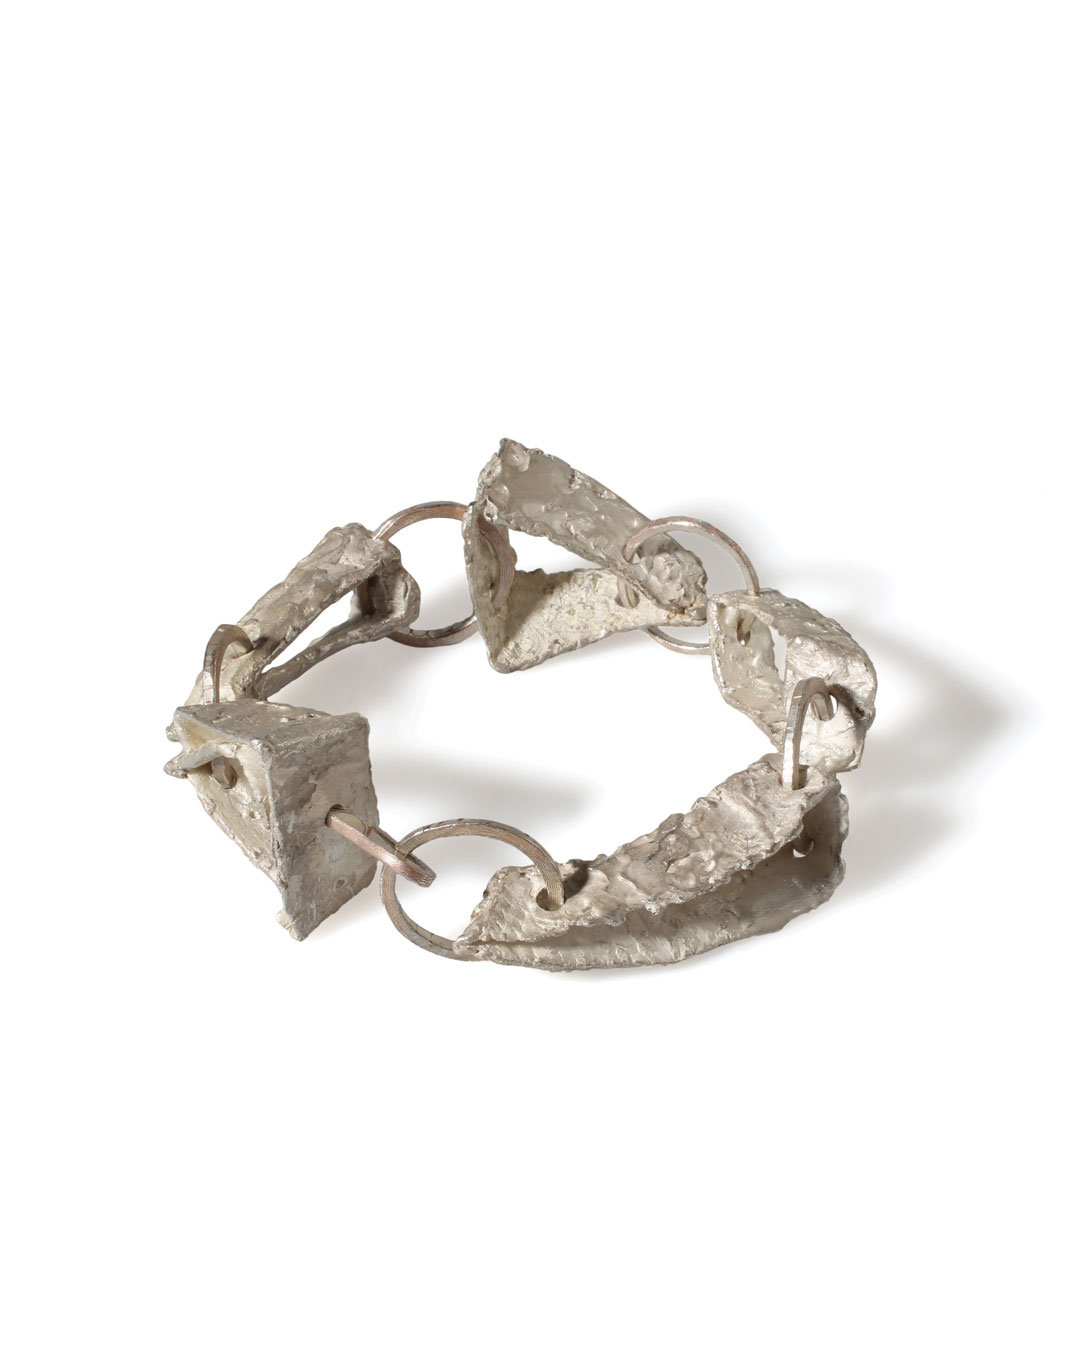 Juliane Brandes, zonder titel, 2013, armband; zilver, koper, 23 x 30 x 15 mm, €2200